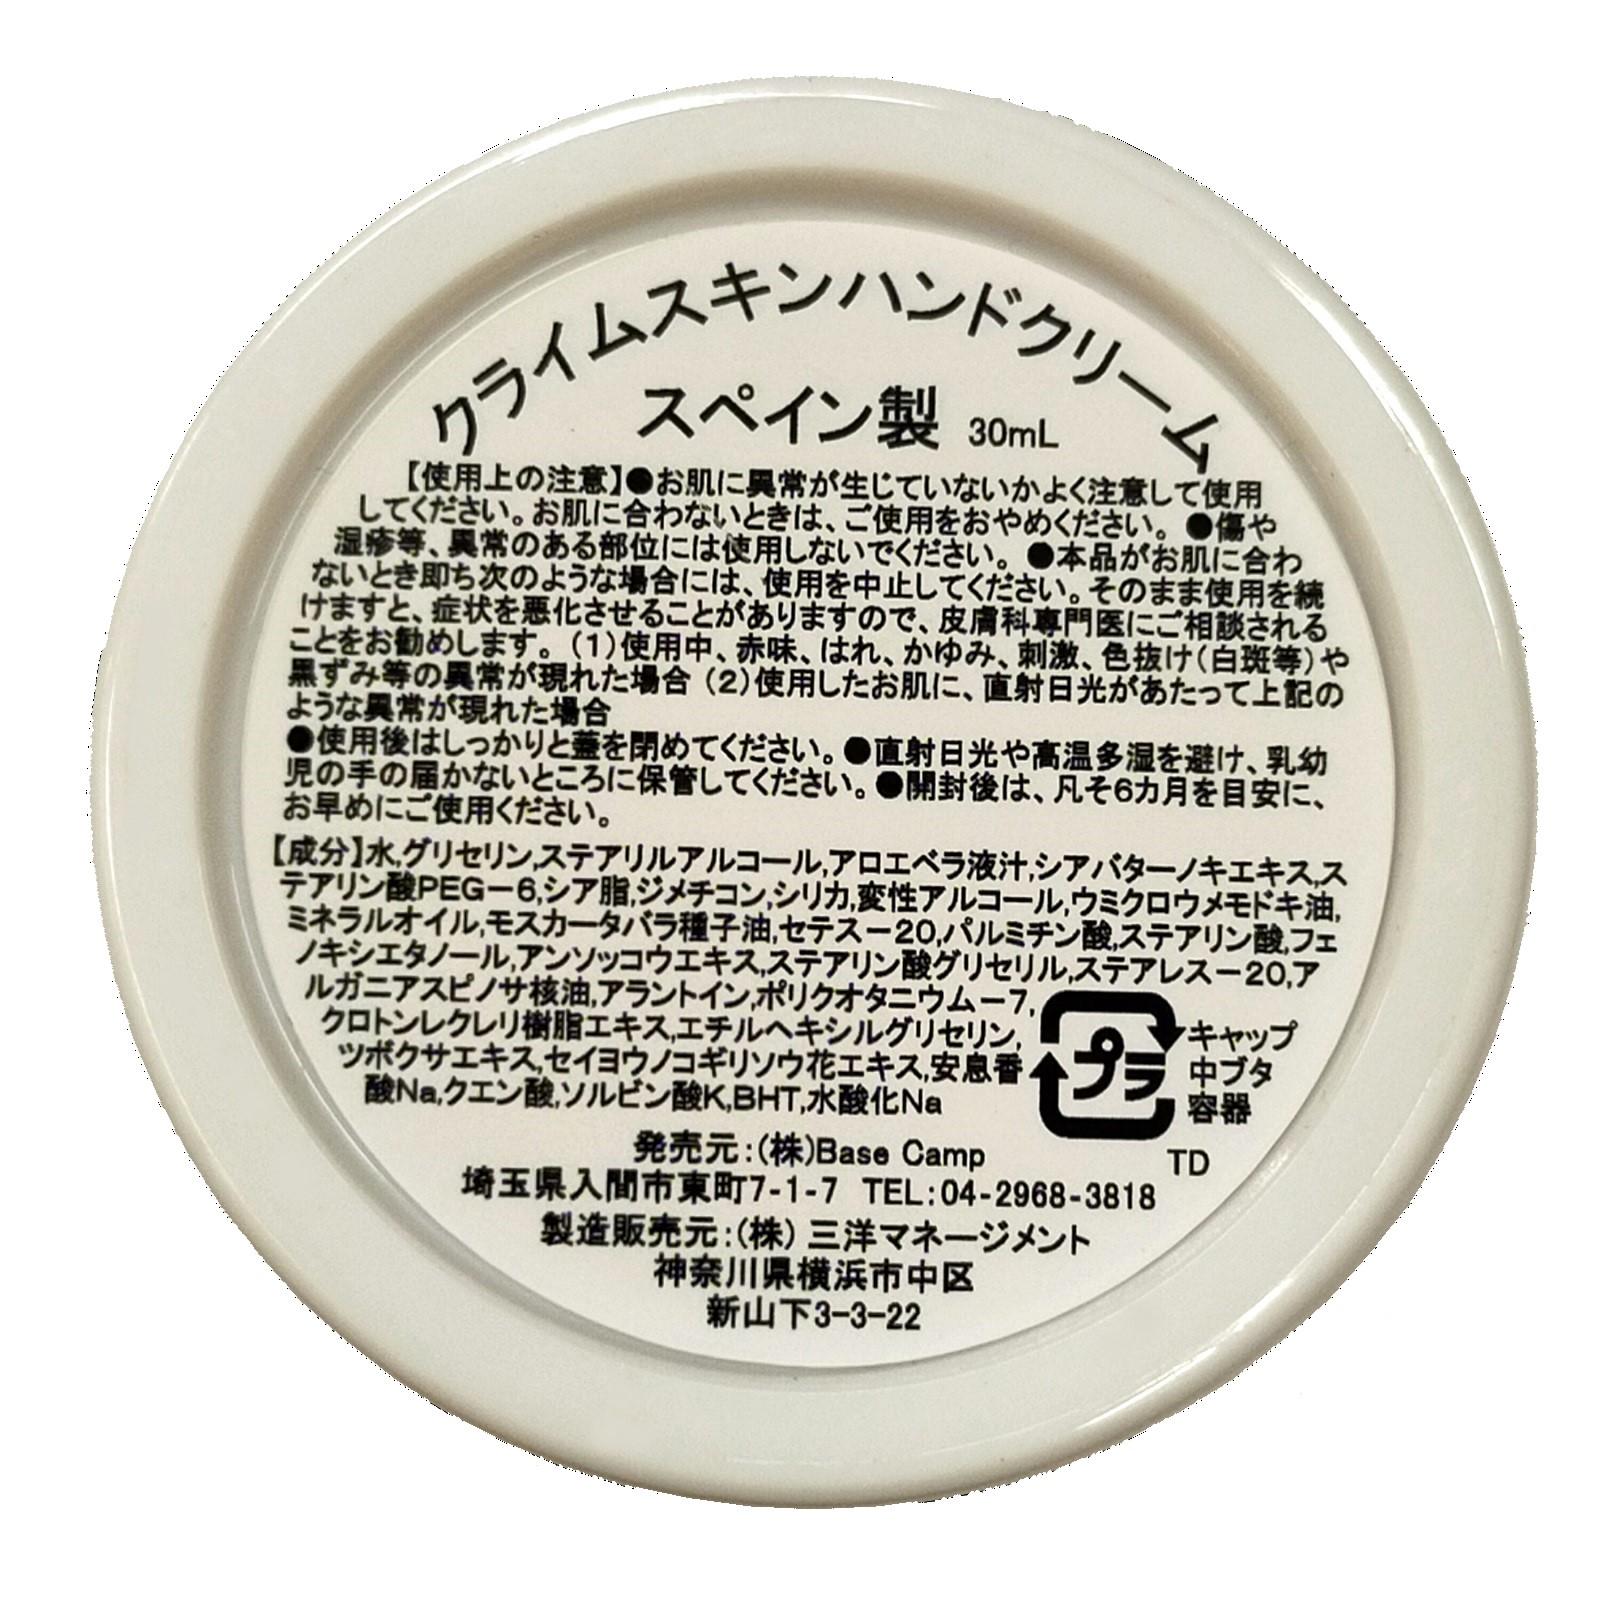 CLIMB SKIN クライムスキン ハンドクリーム 30ml